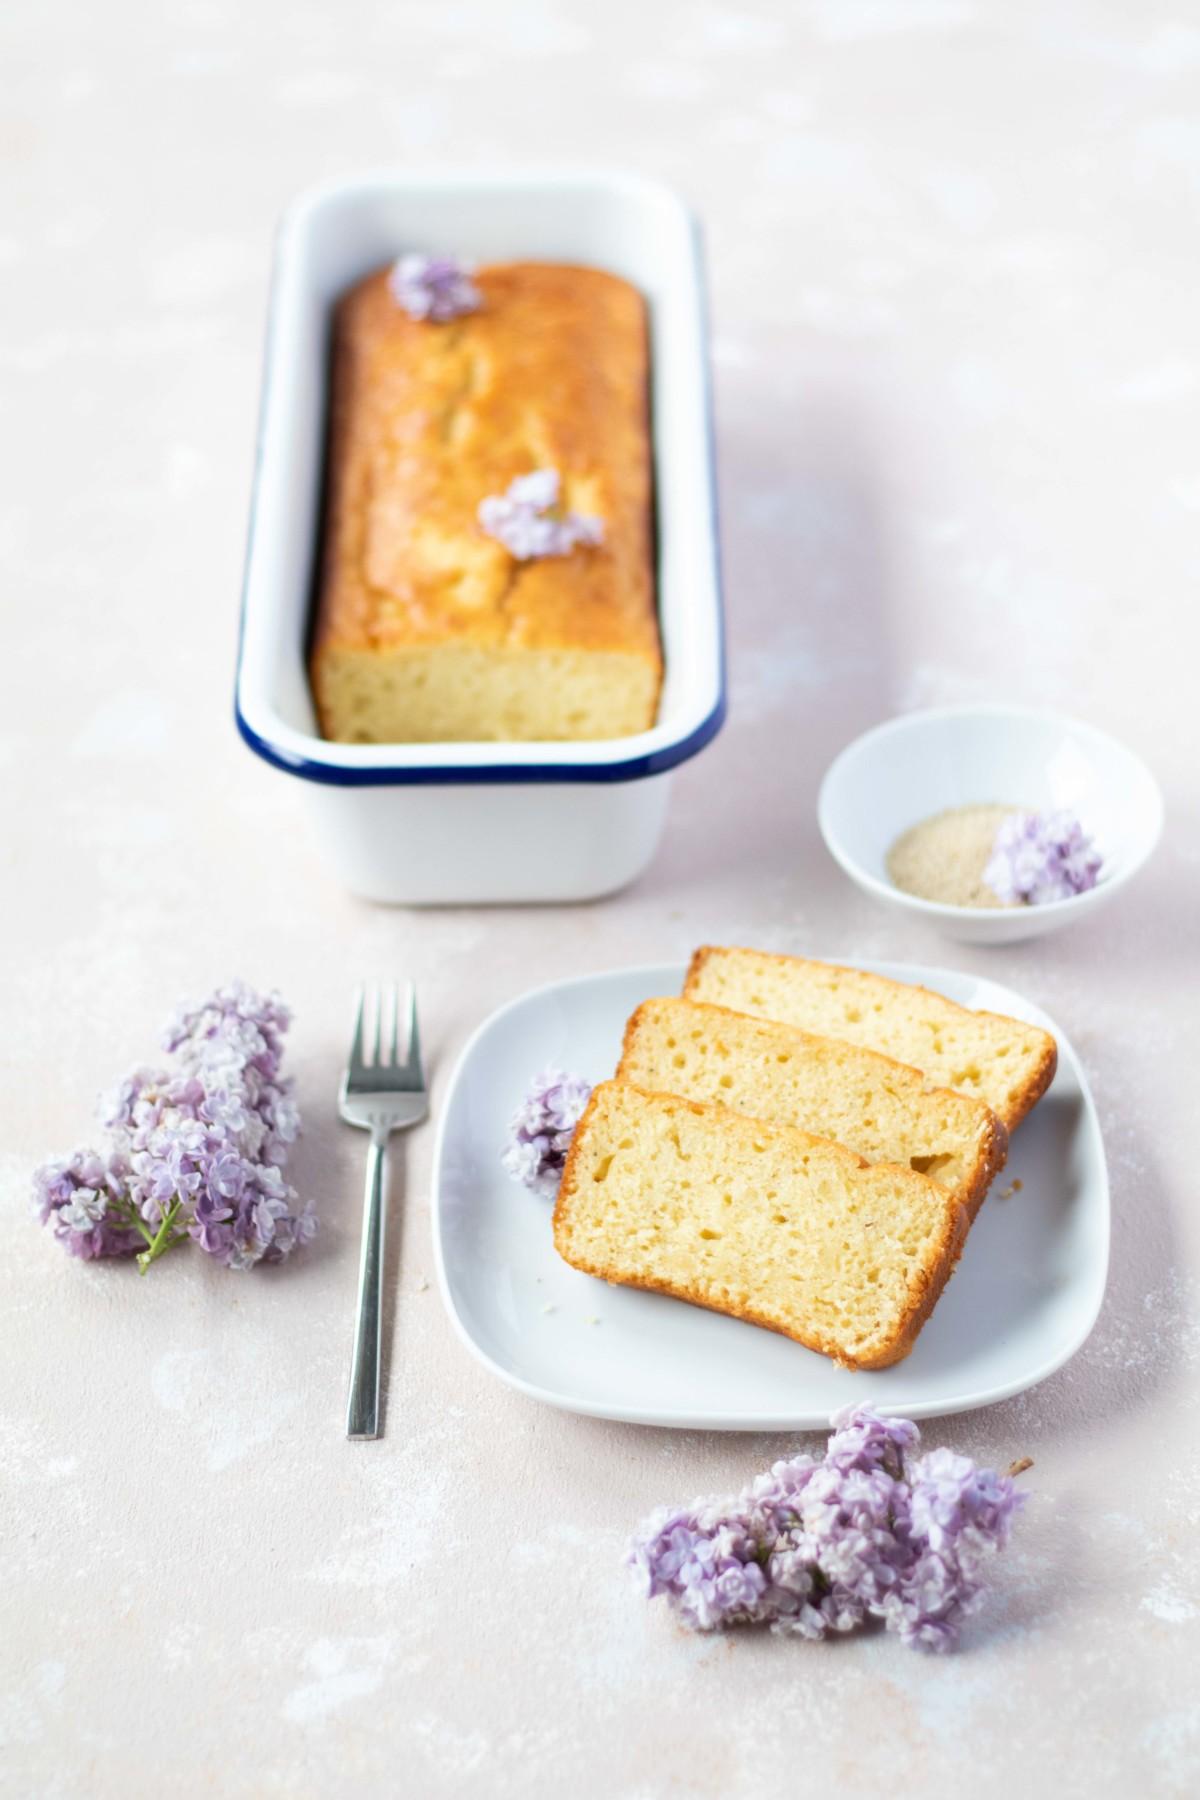 Orangenkuchen mit weißem Mohn // Orange cake with white poppy seeds by https://babyrockmyday.com/orangenkuchen-mit-weissem-mohn/